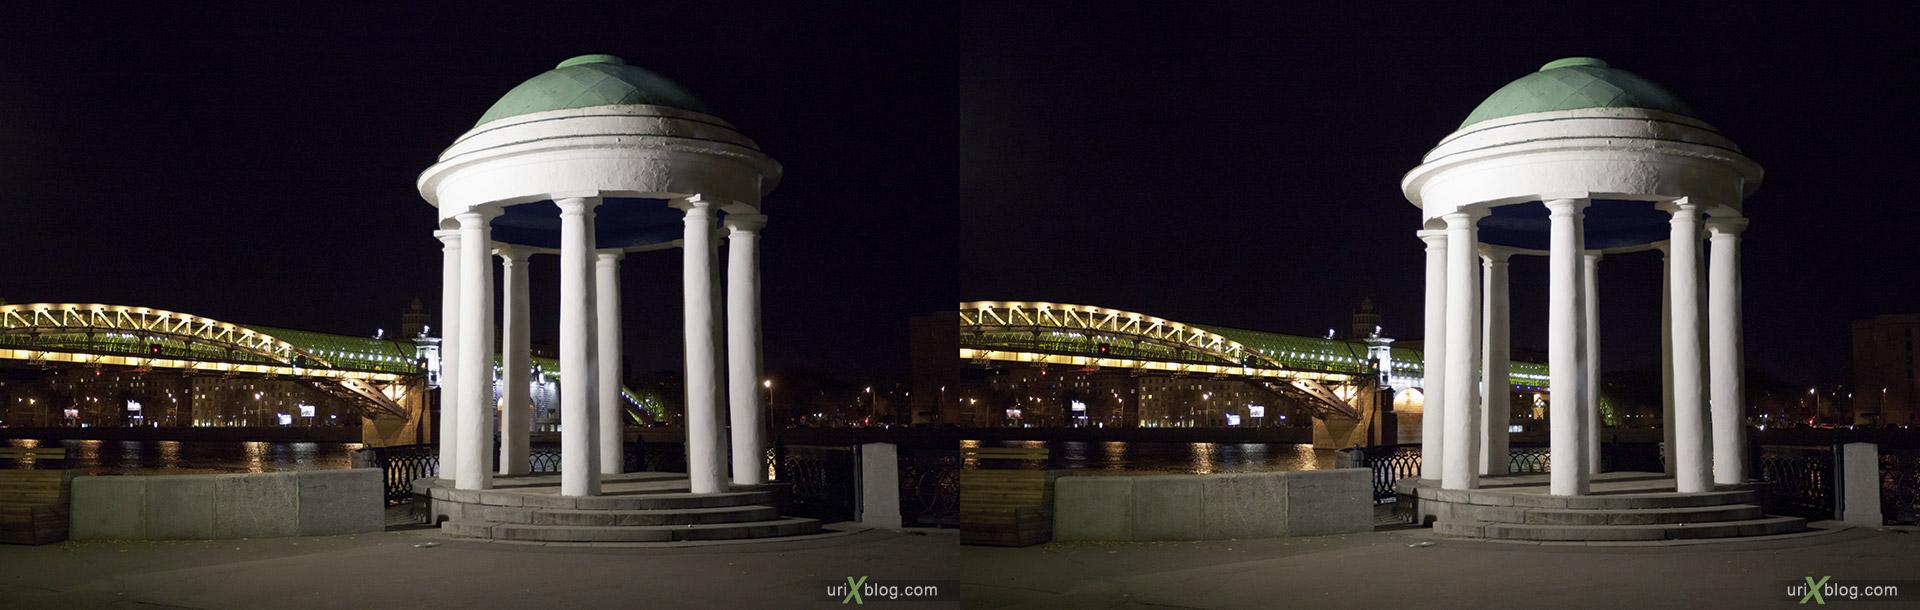 Moscow, Москва, 3D, stereo, стерео, парк Горького